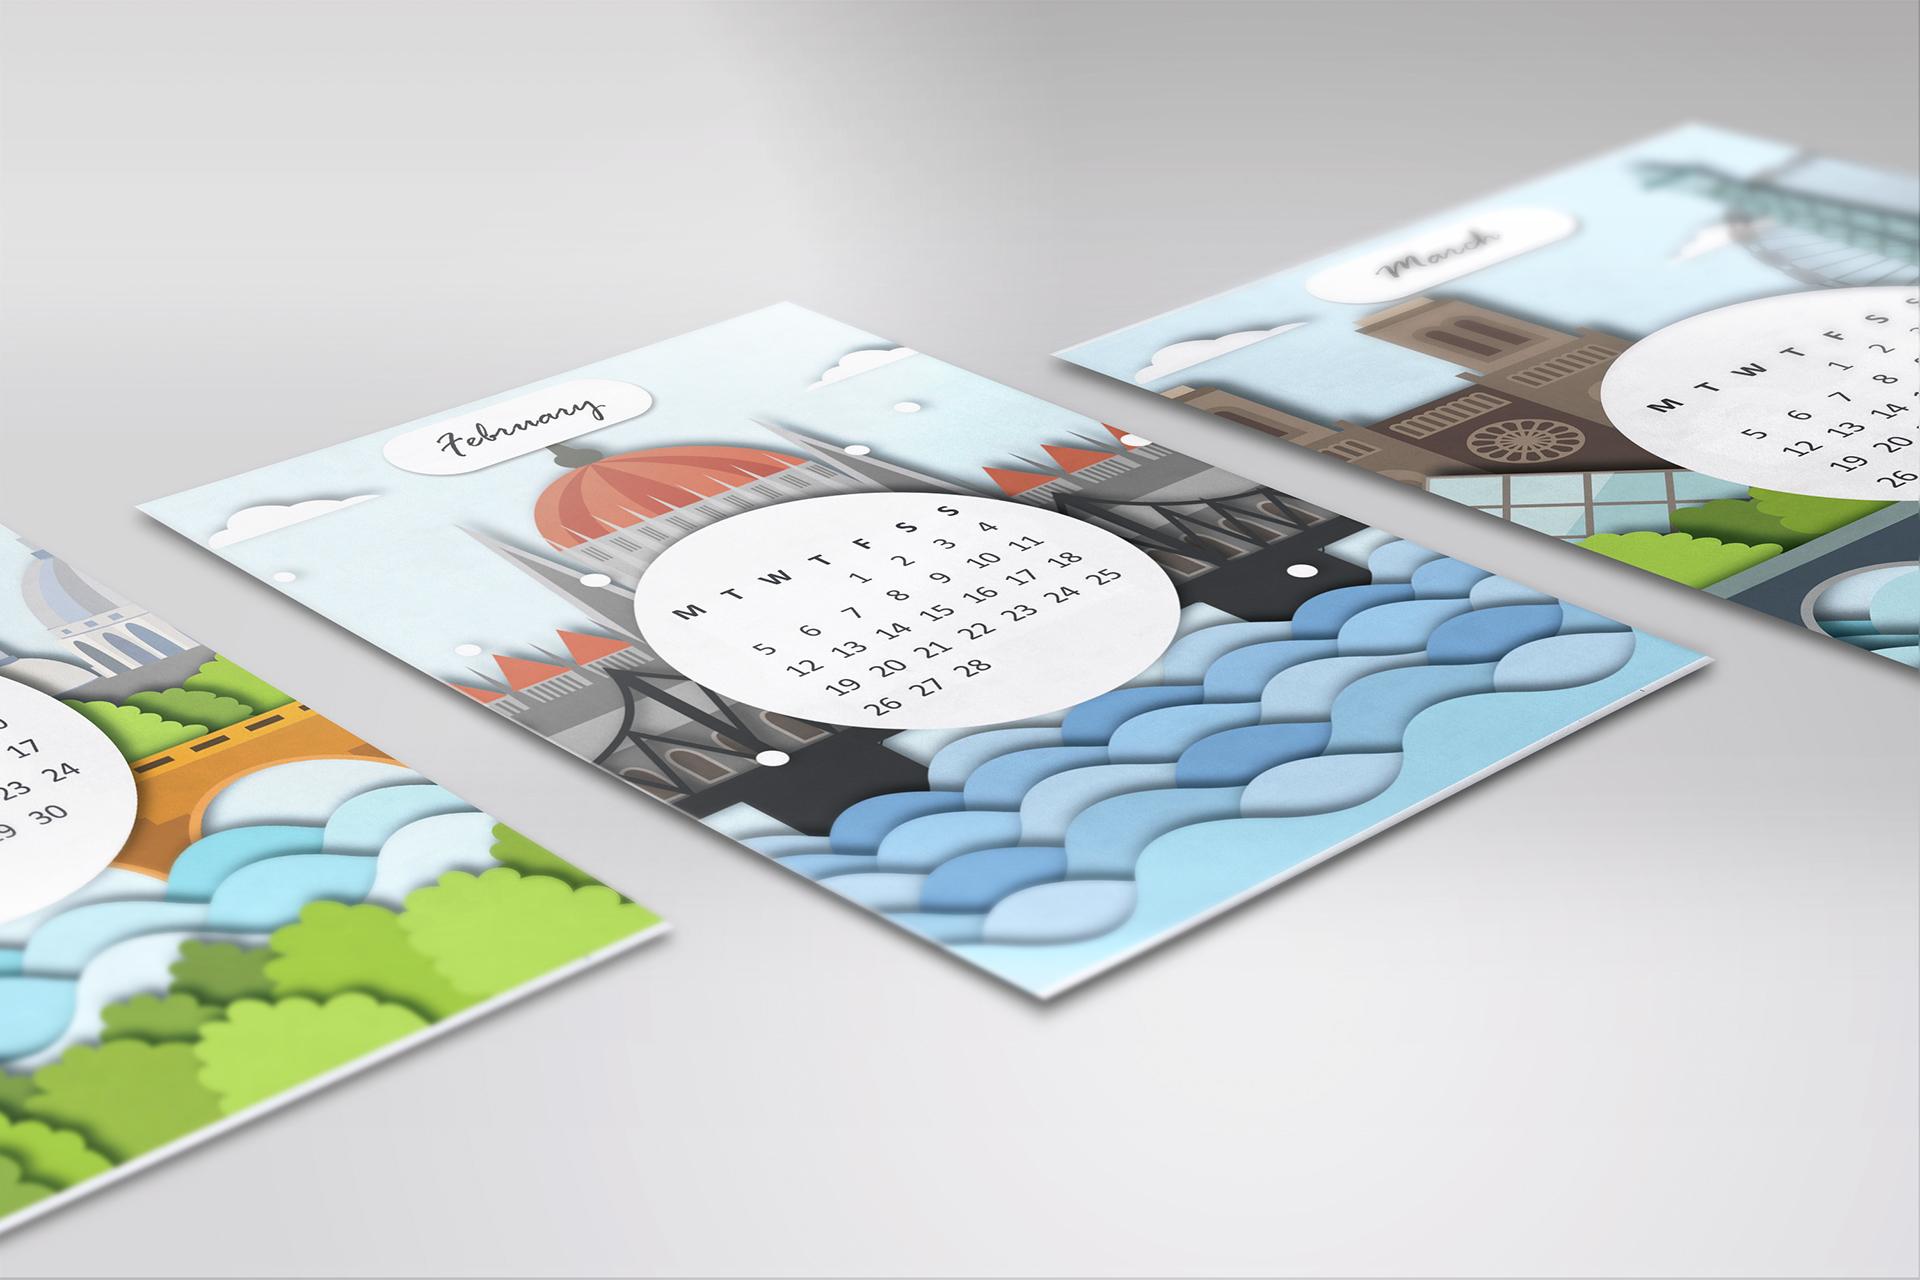 10 Creative 2018 Calendar Designs For Your Inspiration